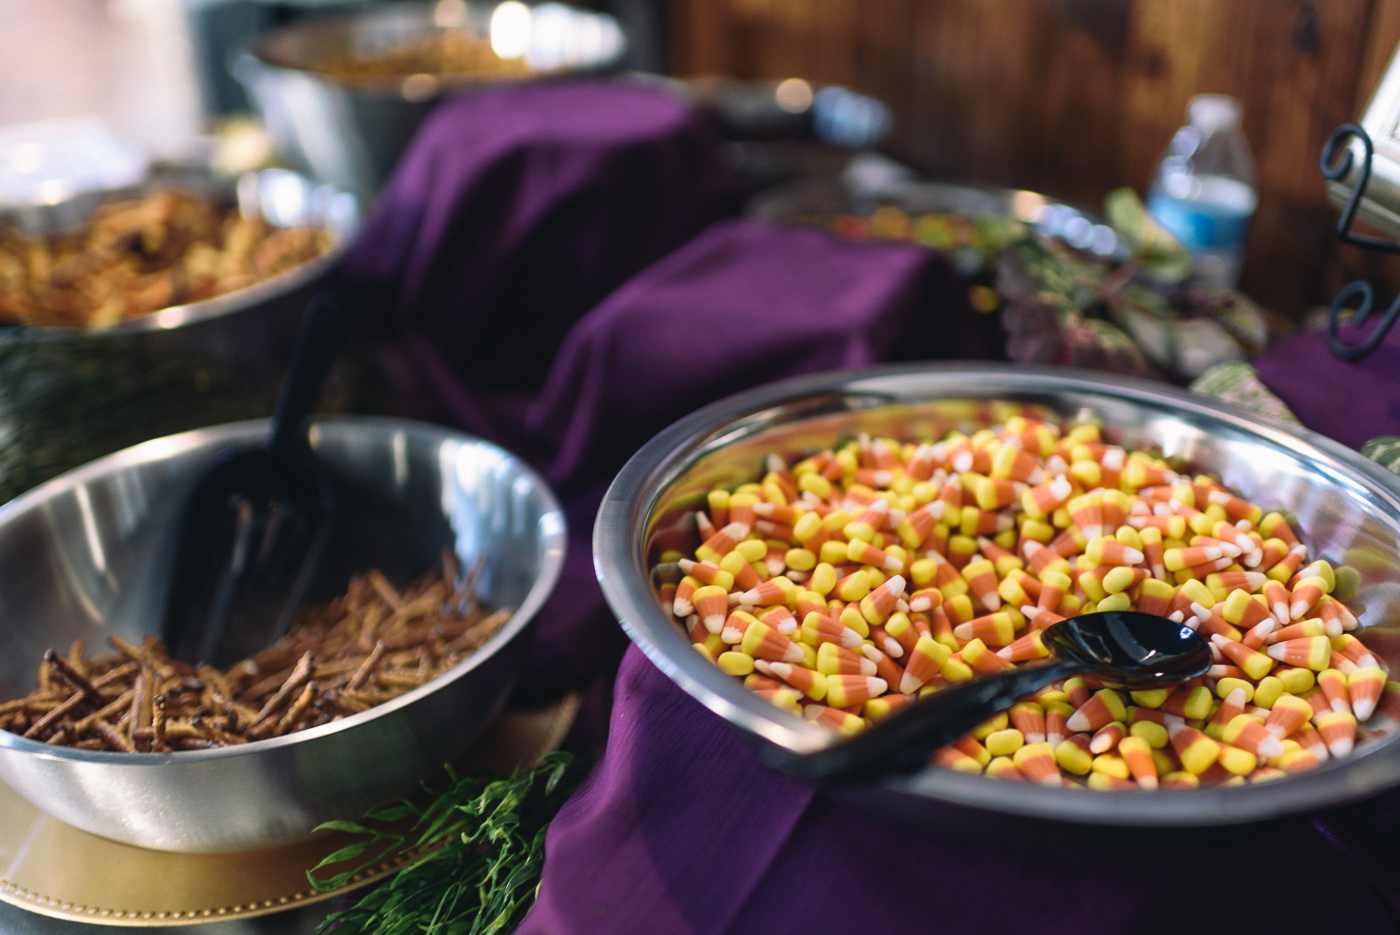 wedding reception snack table candy corn pretzels purple linen